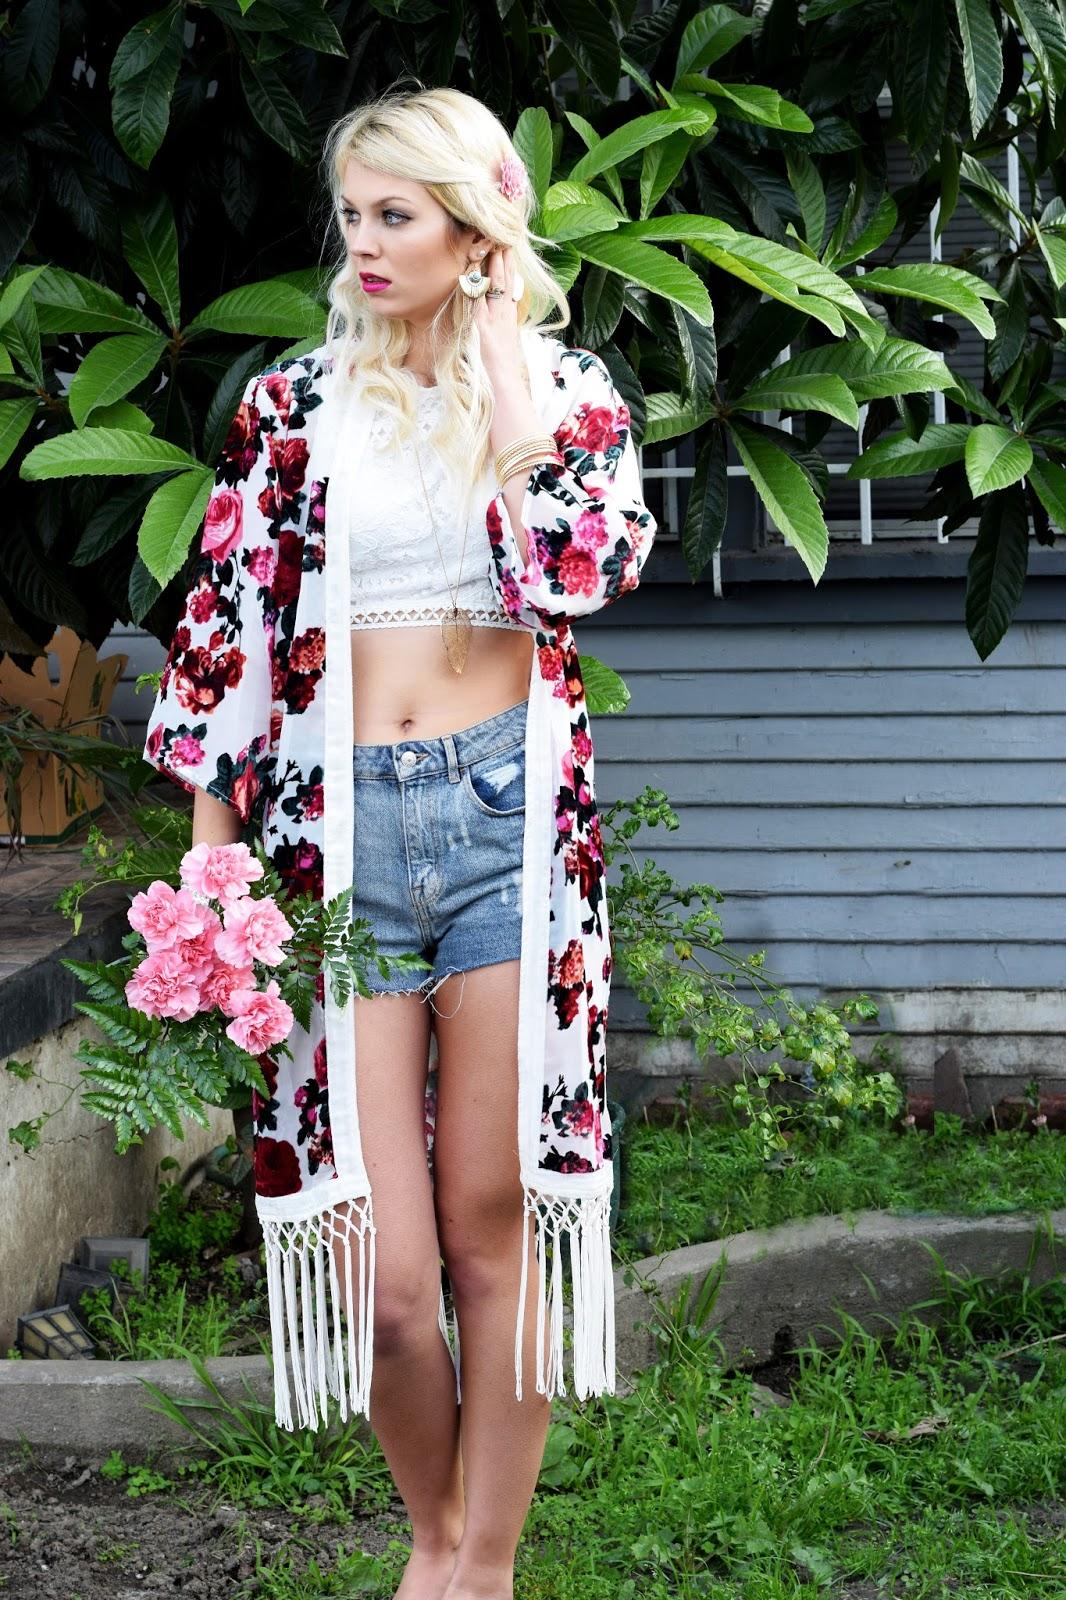 Rose kimono, kimono, coachella, festival, coachella 2016, coachella look, roses, flower child, high waisted jeans shorts, crop top, forever 21 crop top